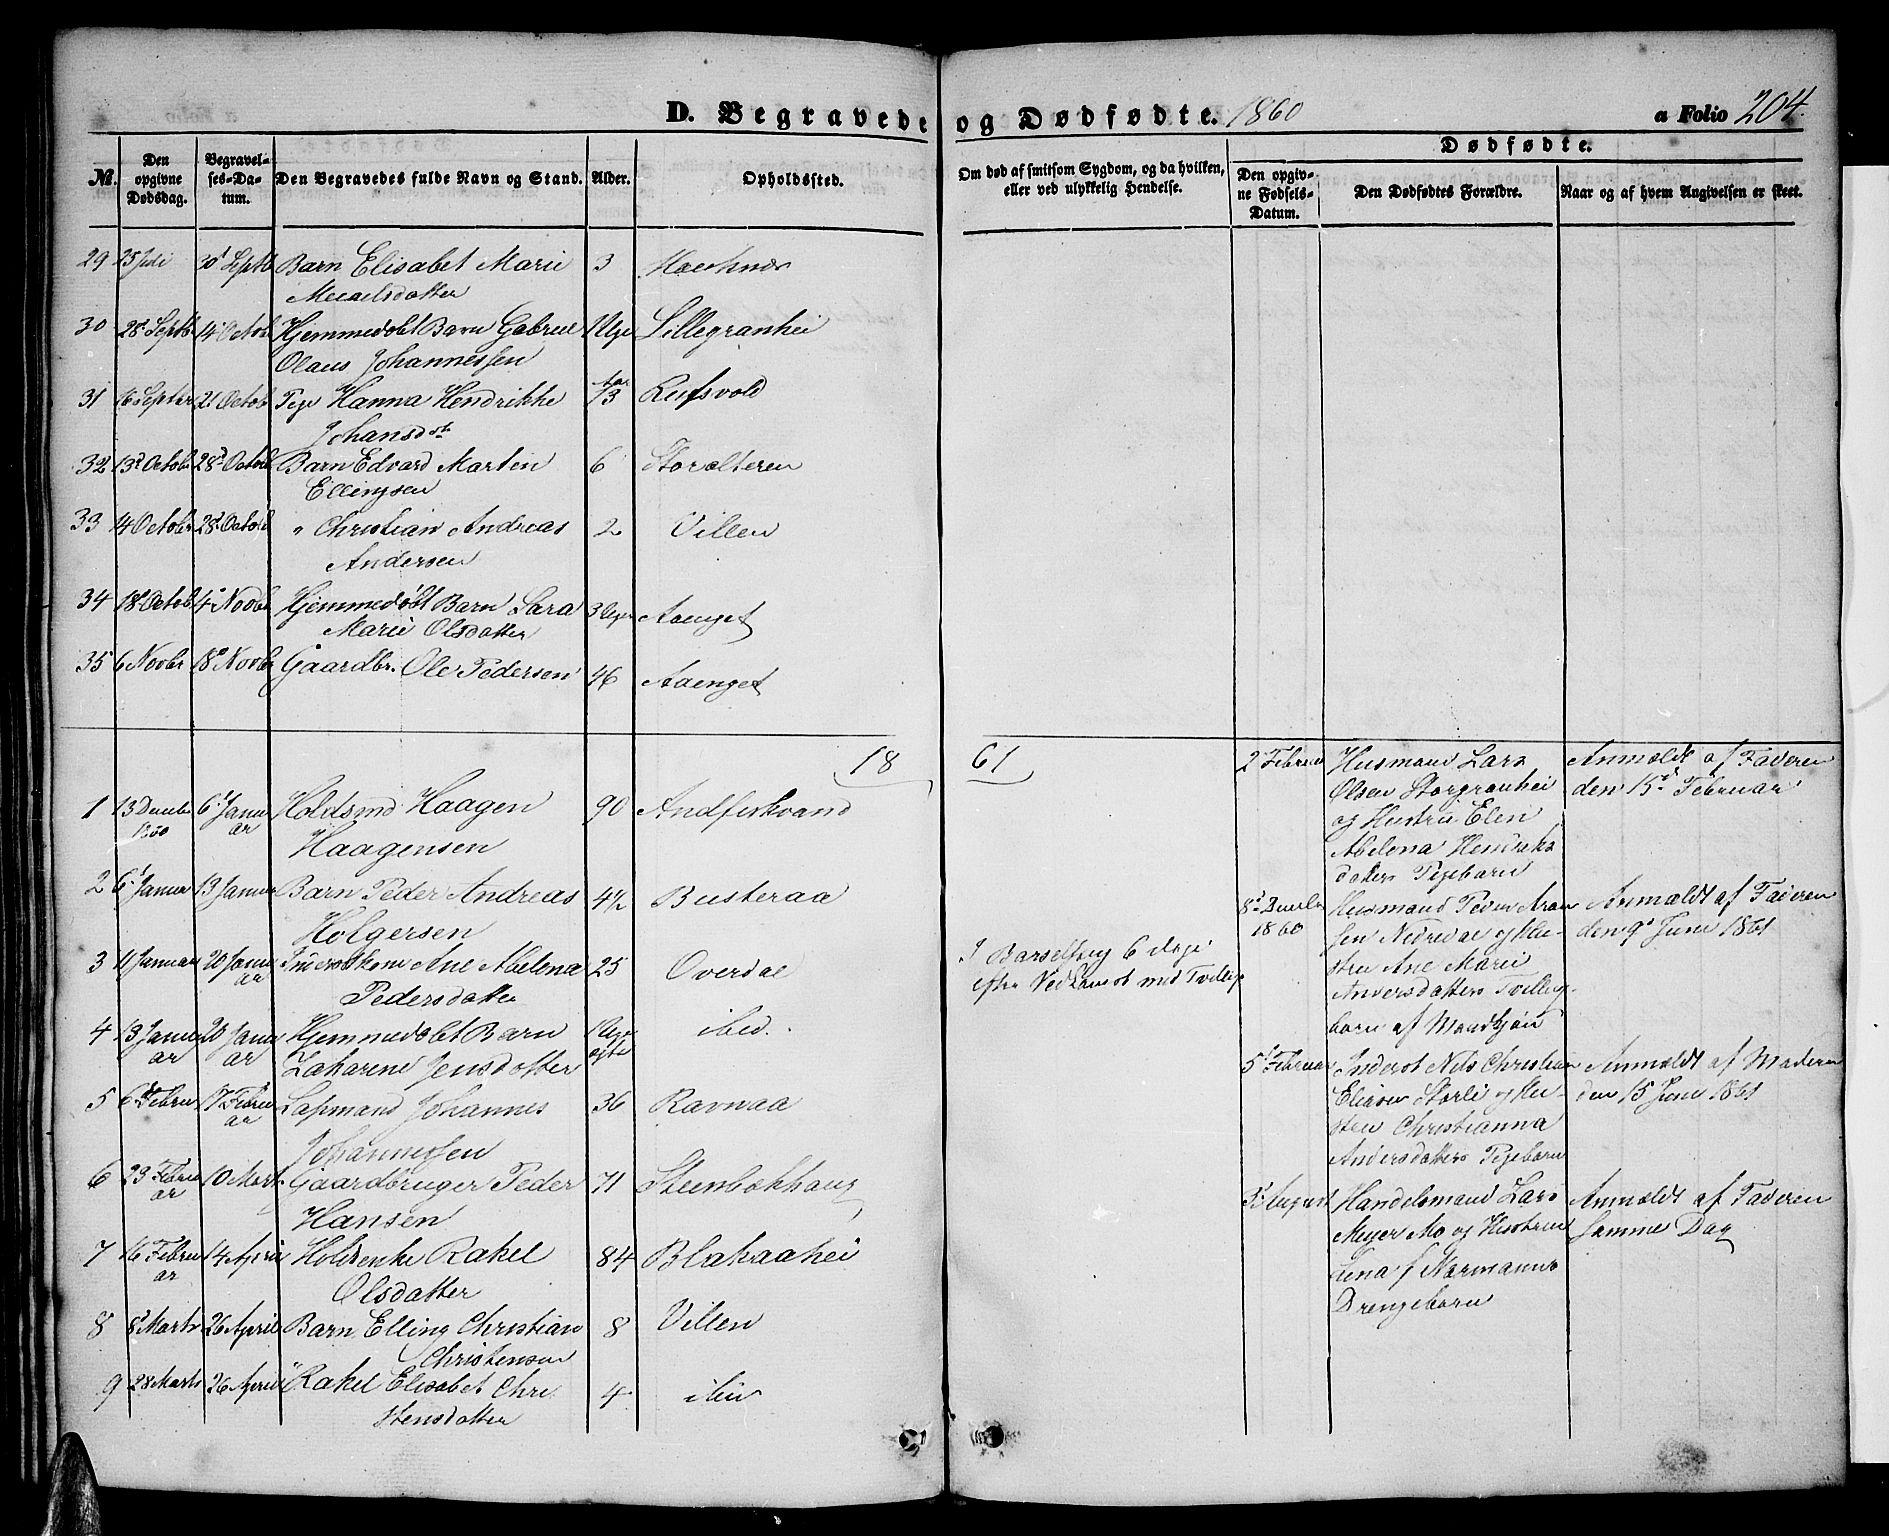 SAT, Ministerialprotokoller, klokkerbøker og fødselsregistre - Nordland, 827/L0414: Klokkerbok nr. 827C03, 1853-1865, s. 204